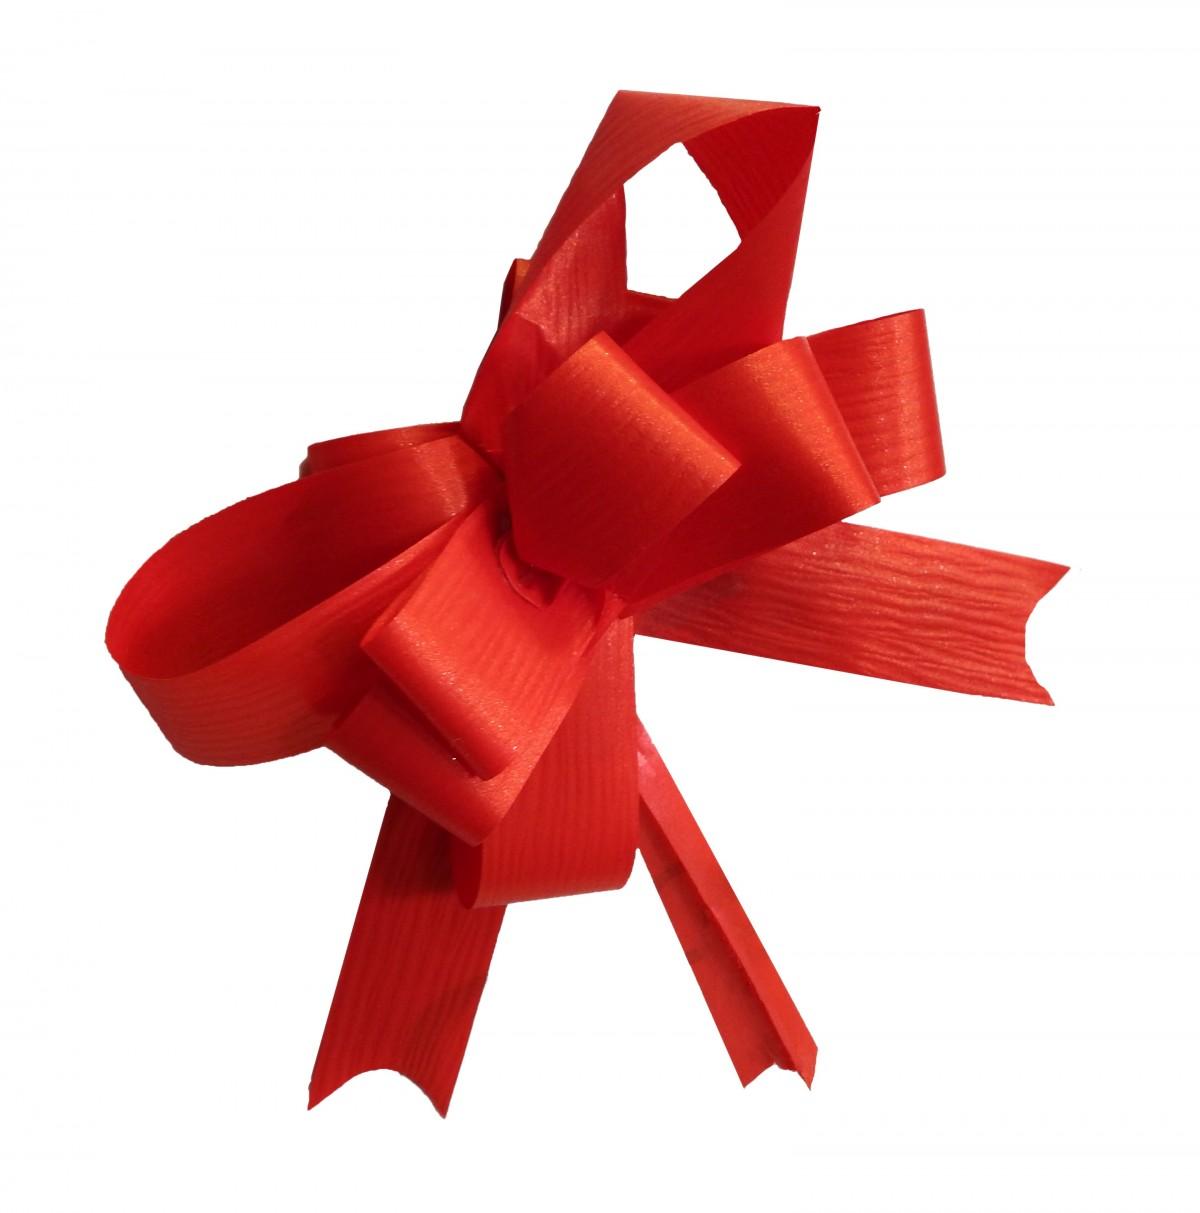 kostenlose foto bl tenblatt geschenk dekoration rot. Black Bedroom Furniture Sets. Home Design Ideas